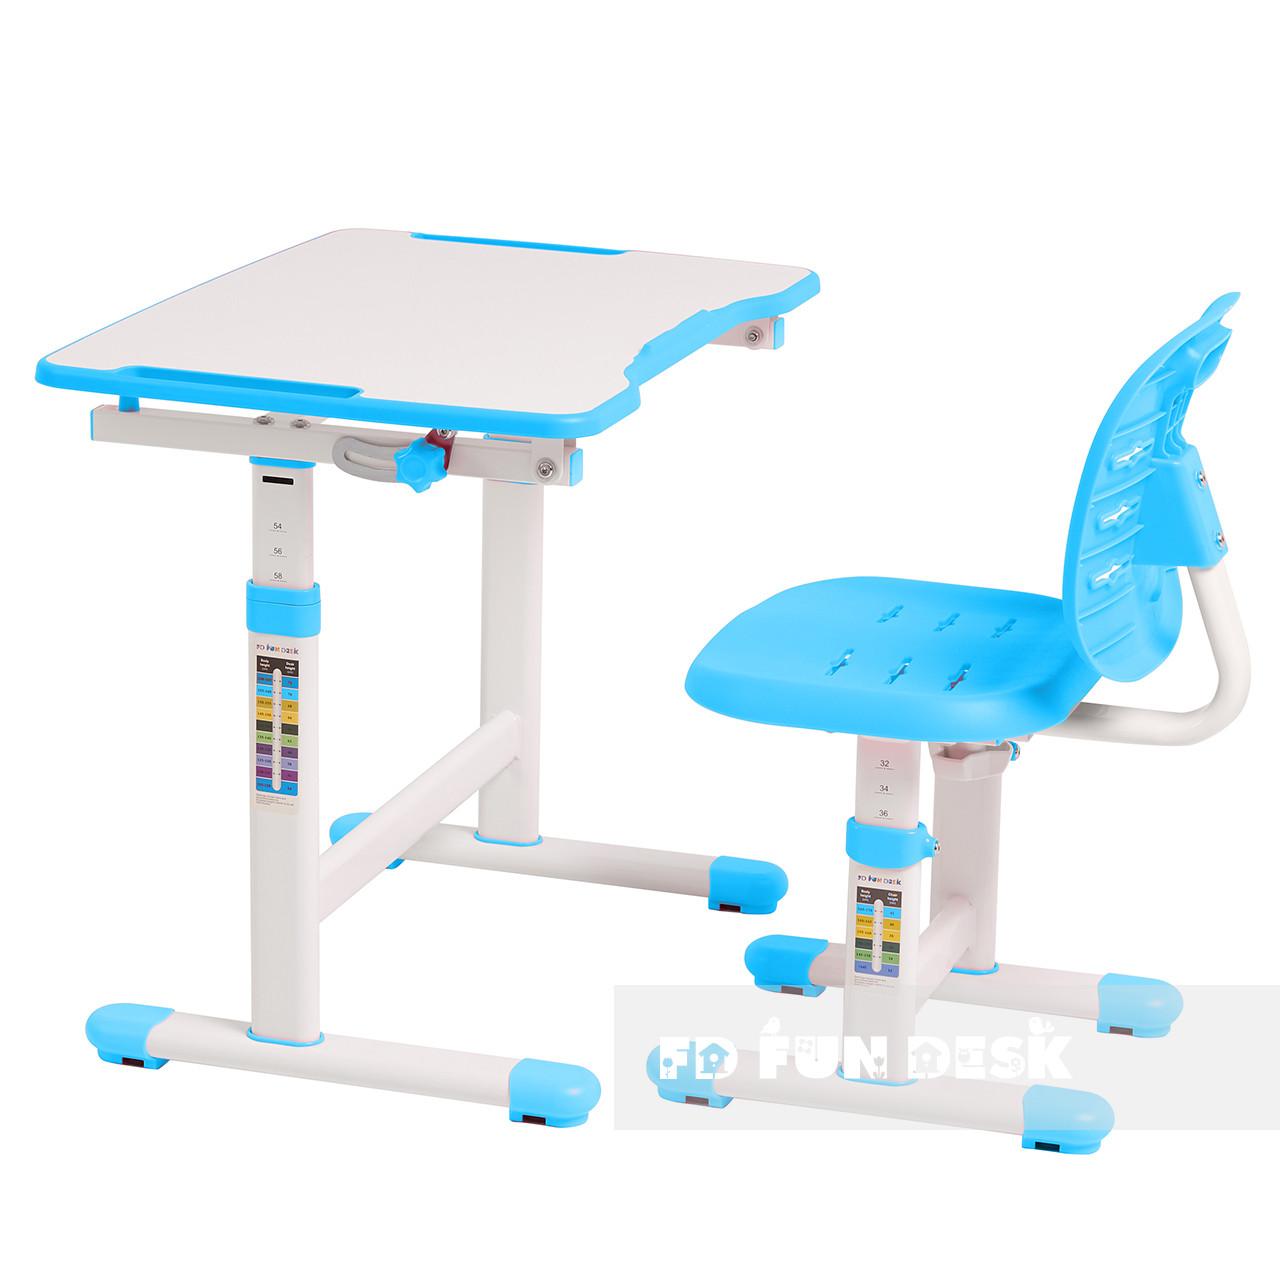 Комплект парта + стул трансформеры Omino Blue FunDesk